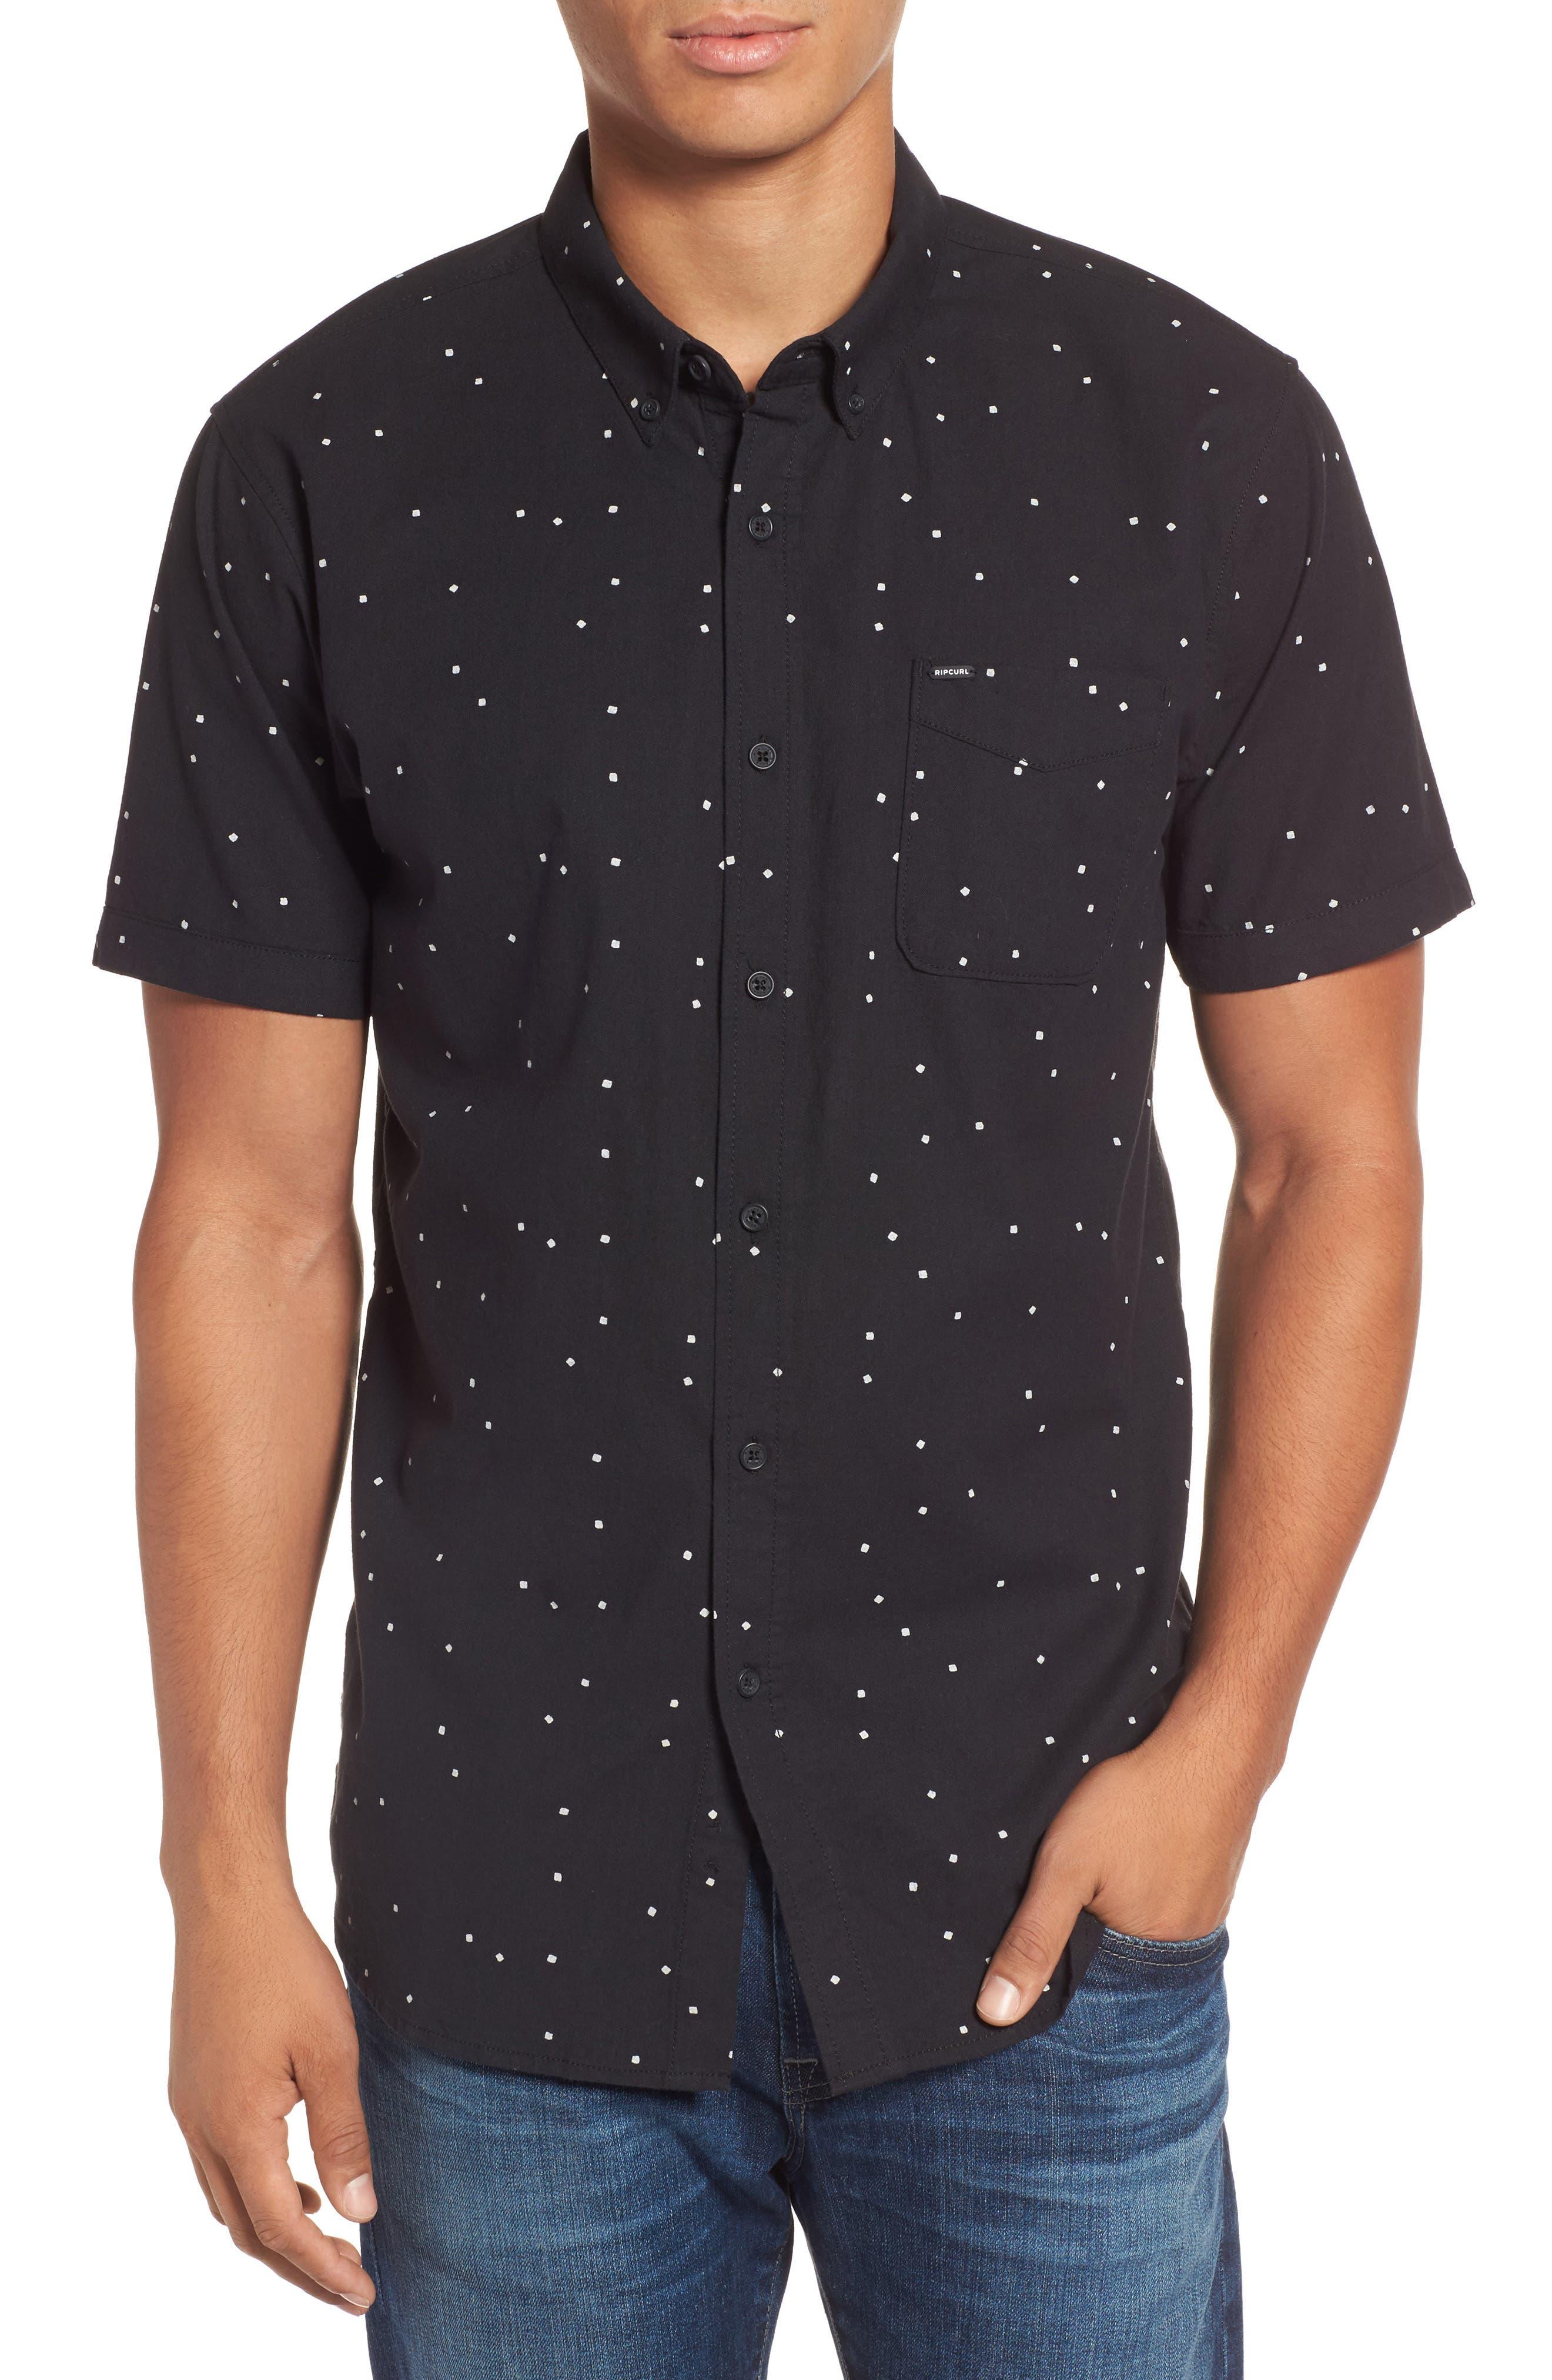 Mixter Short Sleeve Shirt,                         Main,                         color, Black